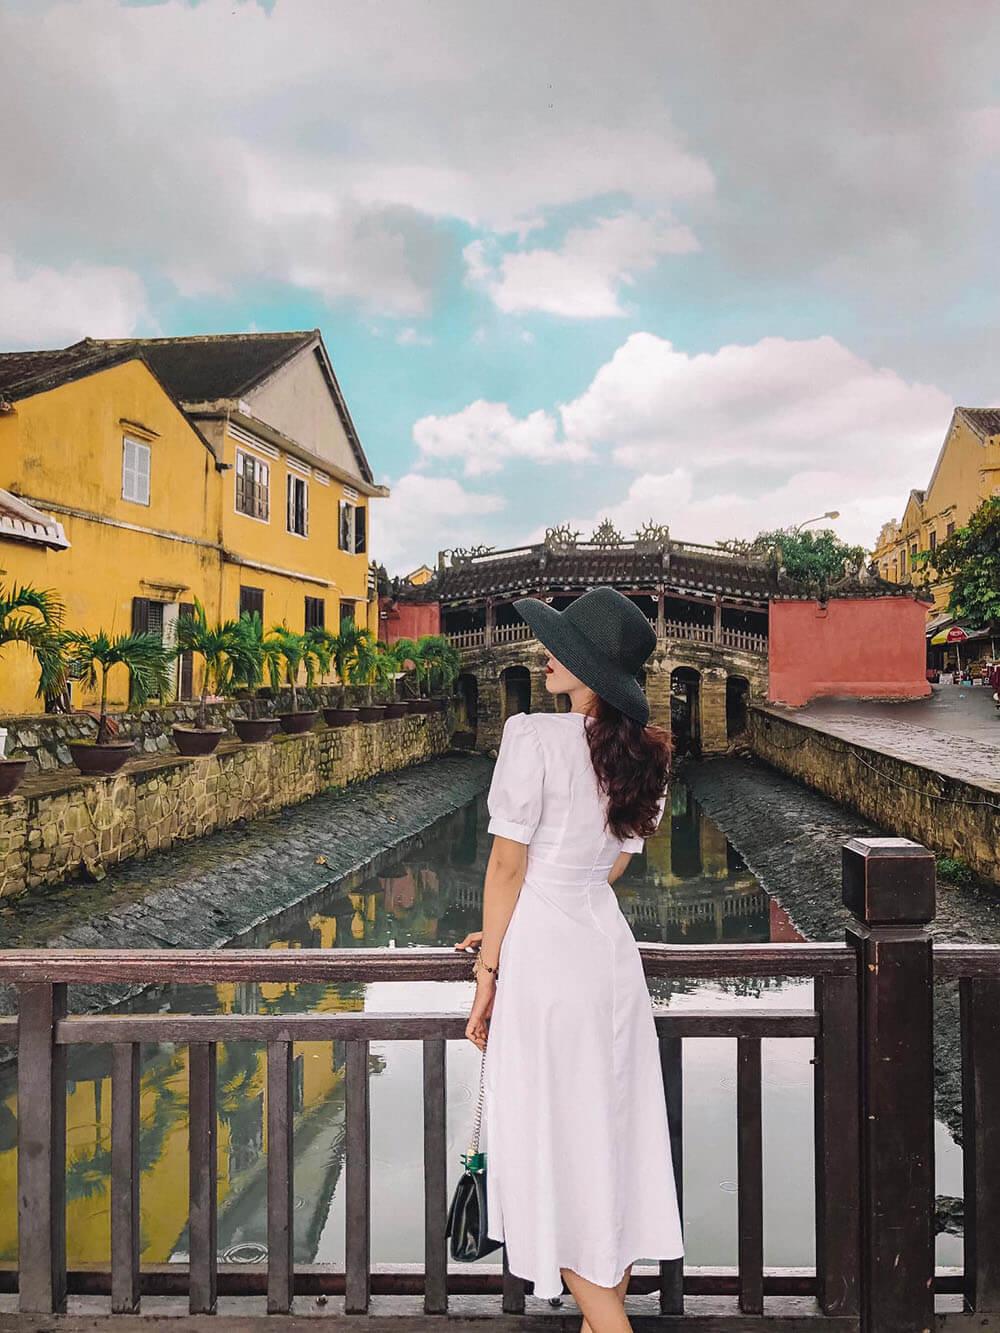 Pho Co Hoi An Review Hue Da Nang Hoi An Ninh Binh 7n7d Chi Voi 8 Trieu Tin Duoc Khong 01